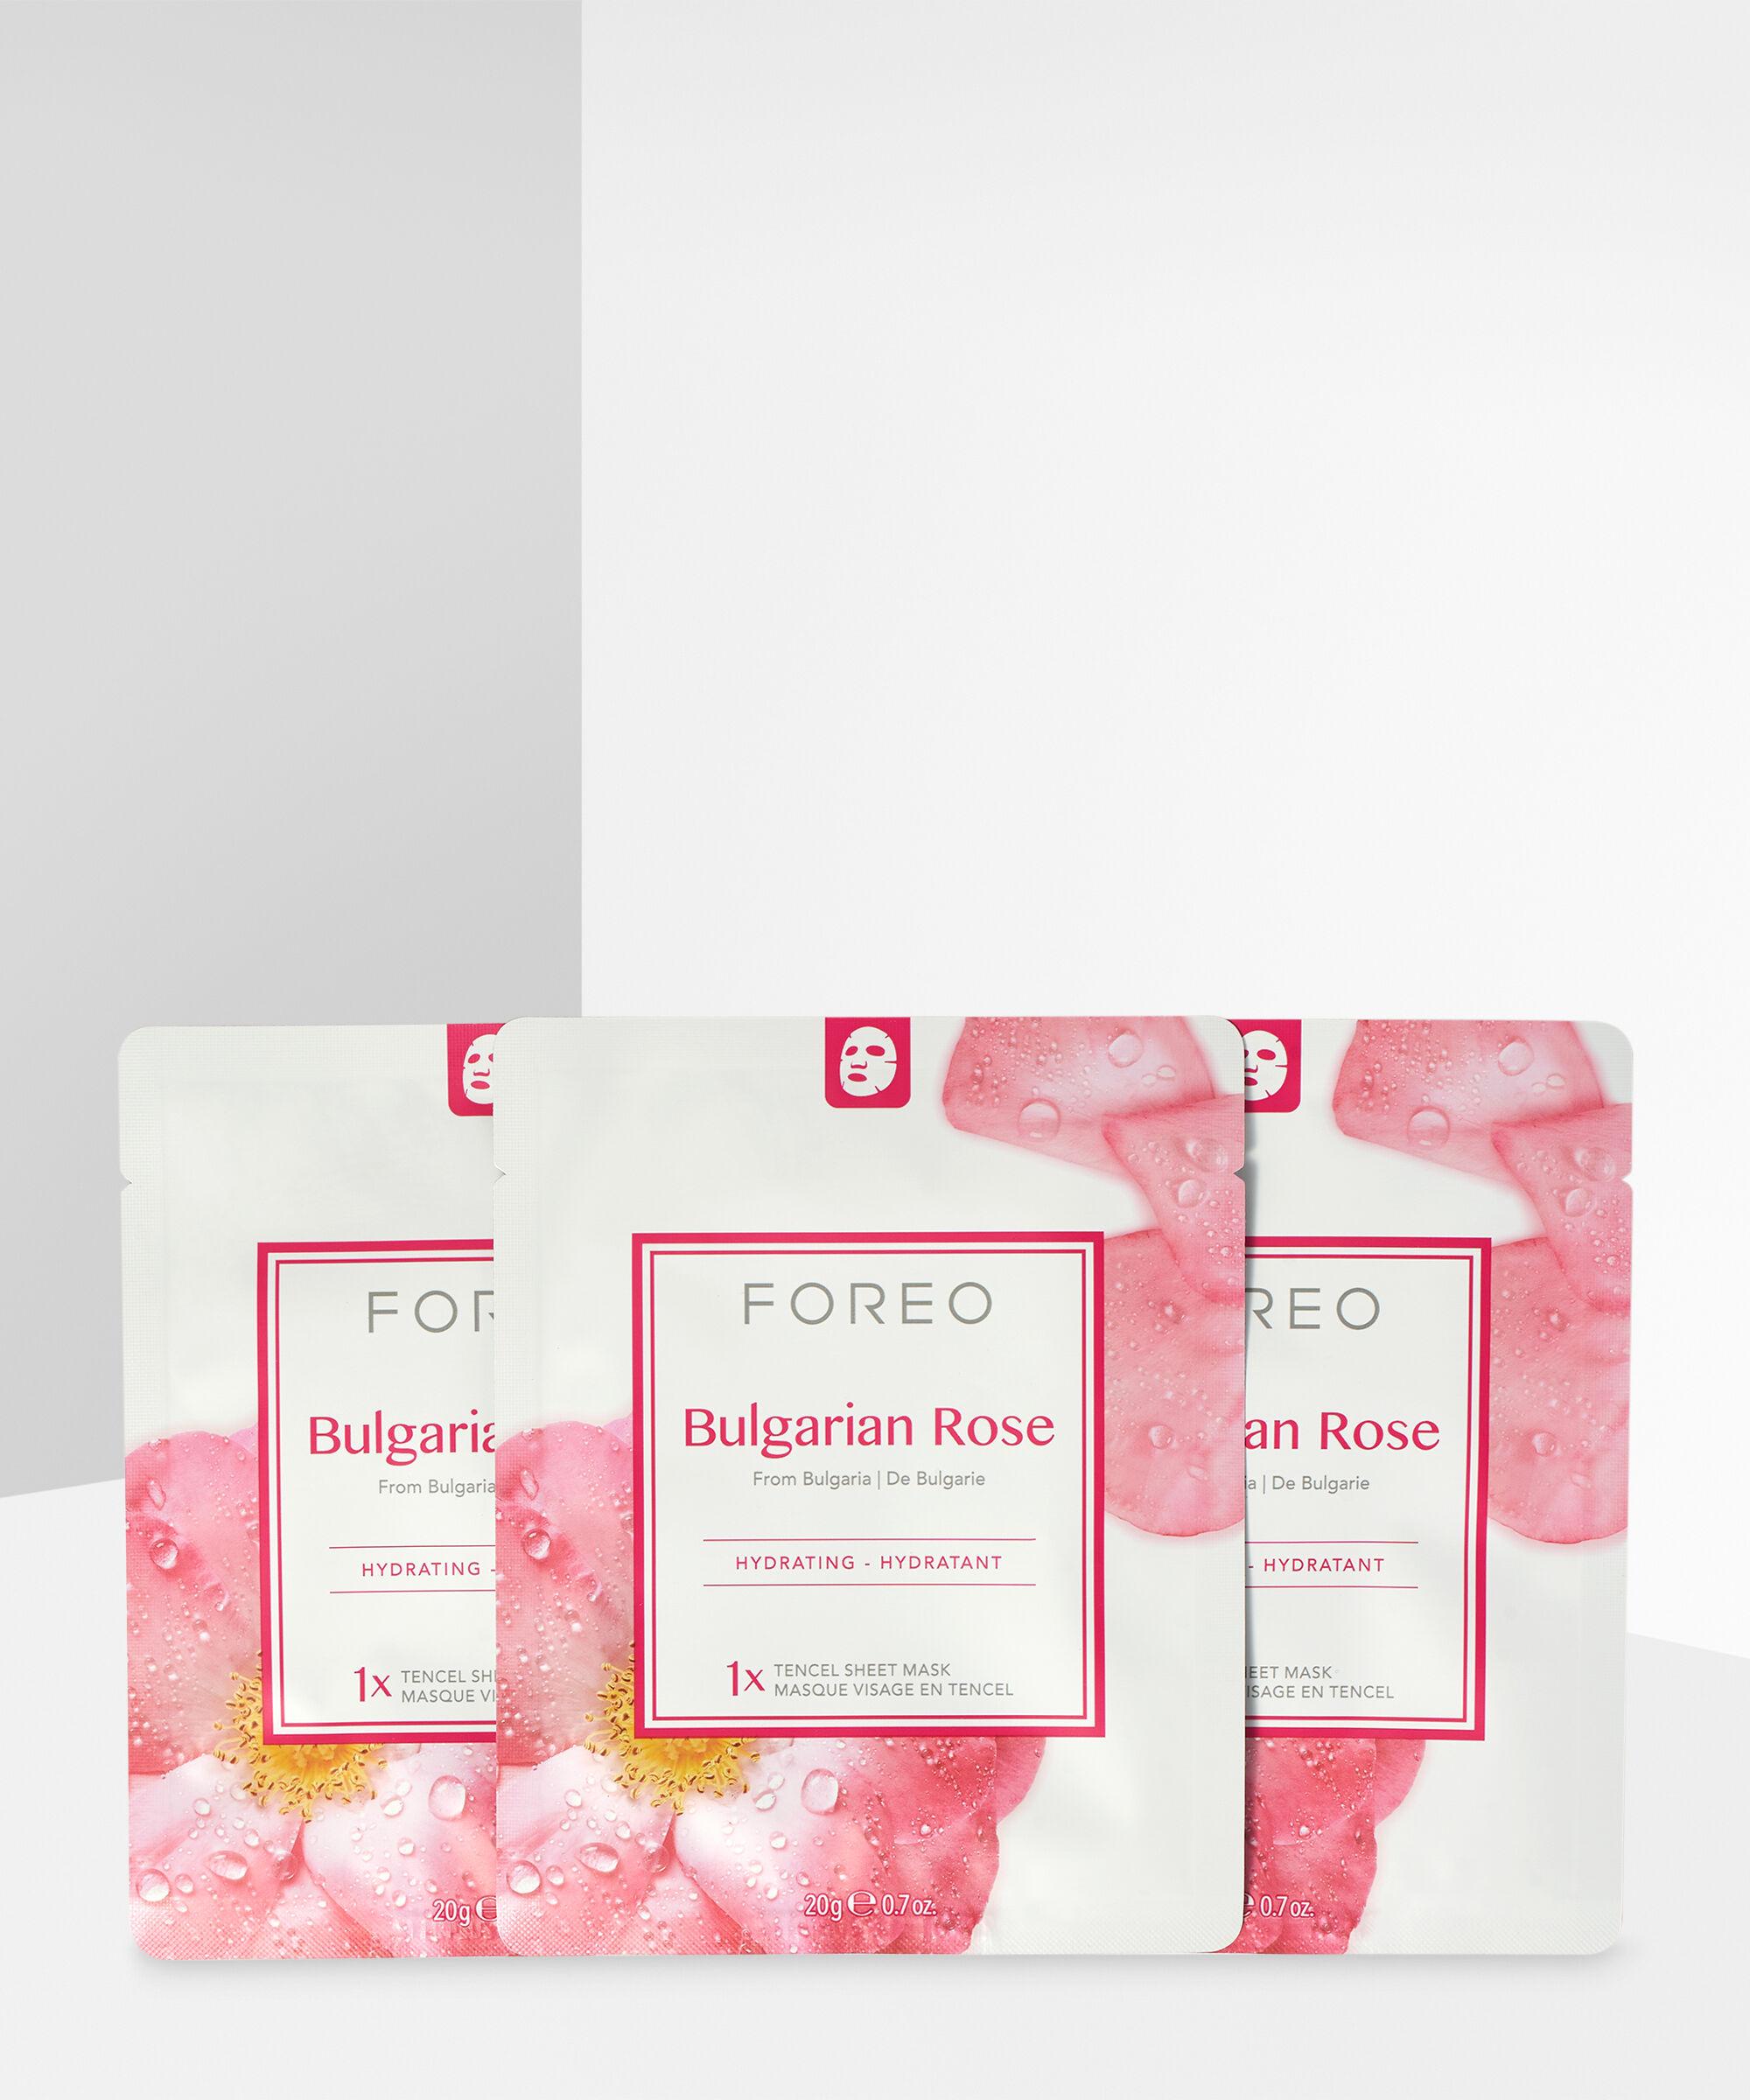 Foreo - Bulgarian Rose Moisture-Boosting Sheet Face Mask